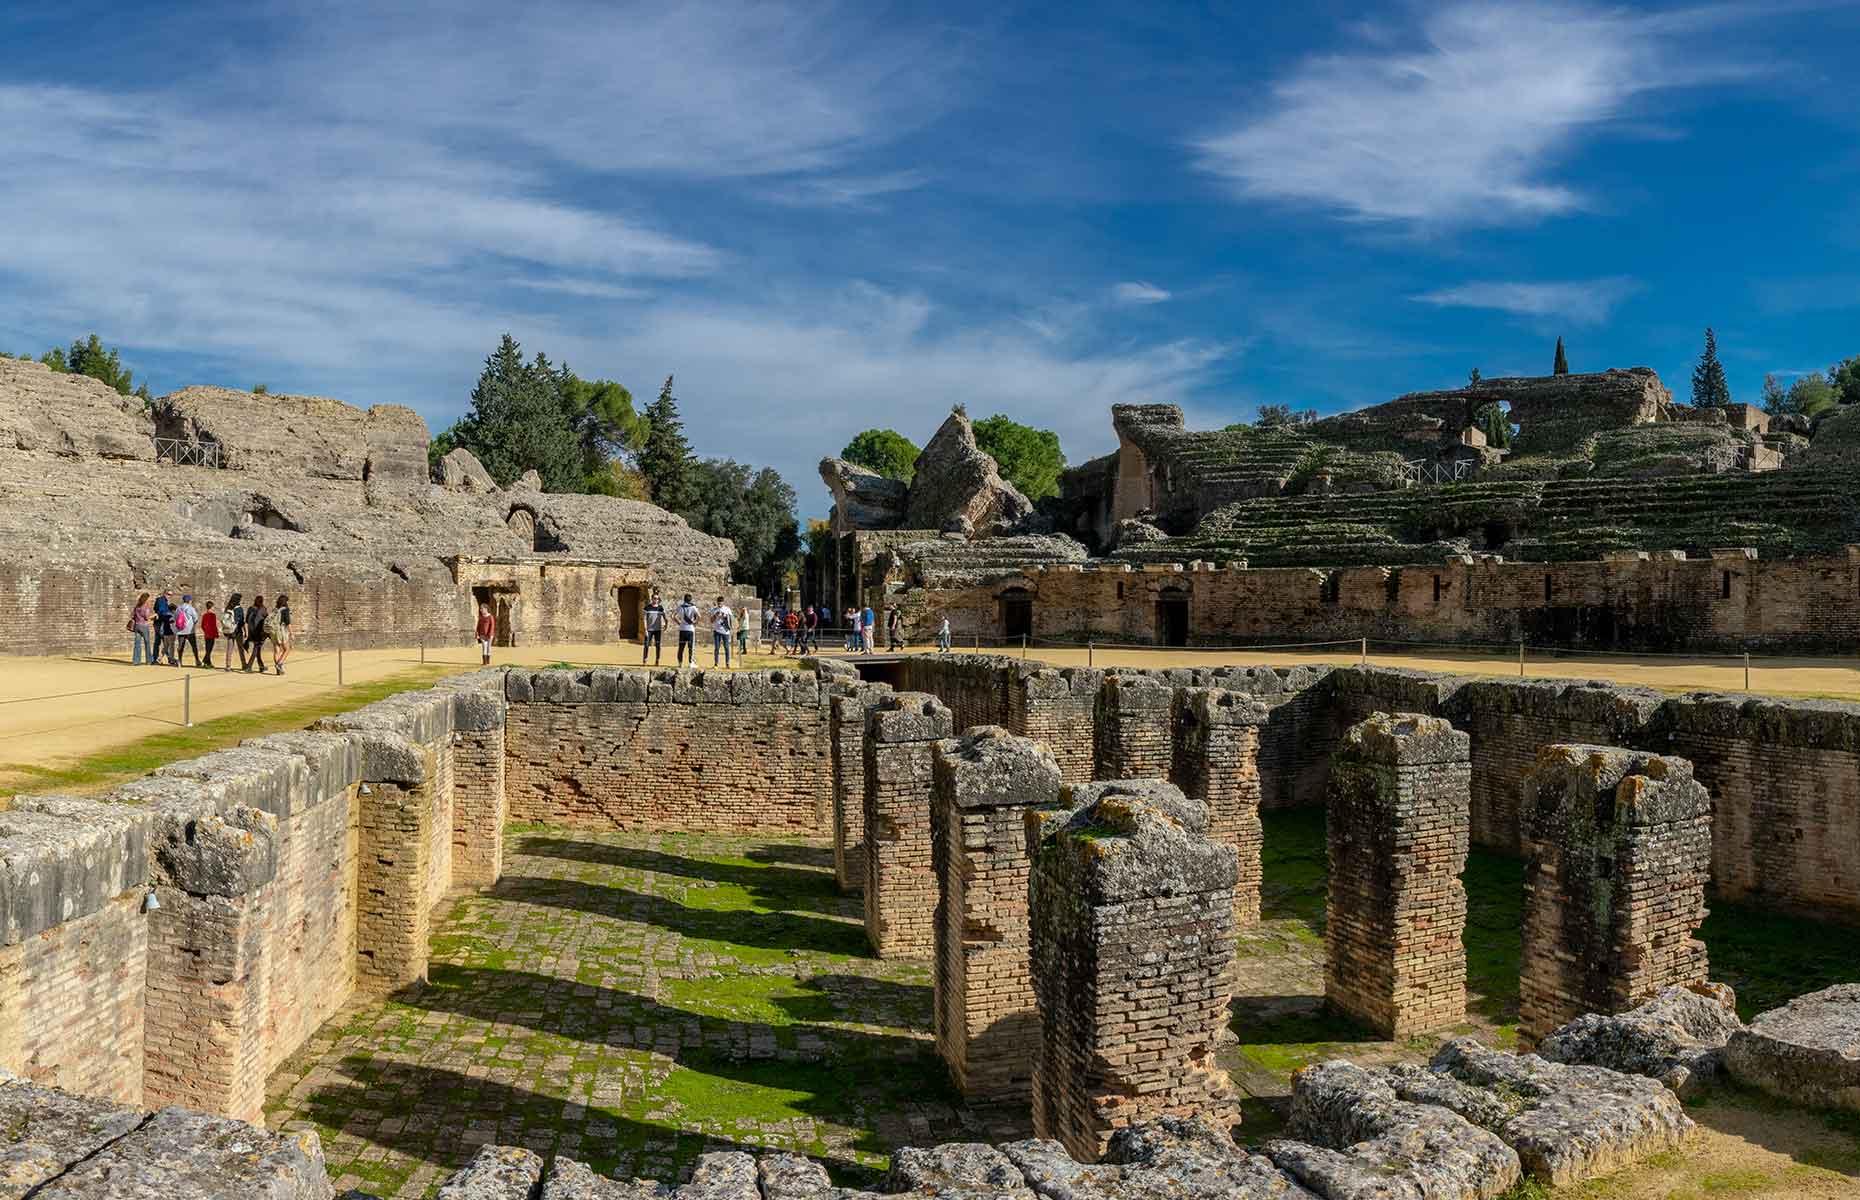 Italica Roman ruins, near Seville